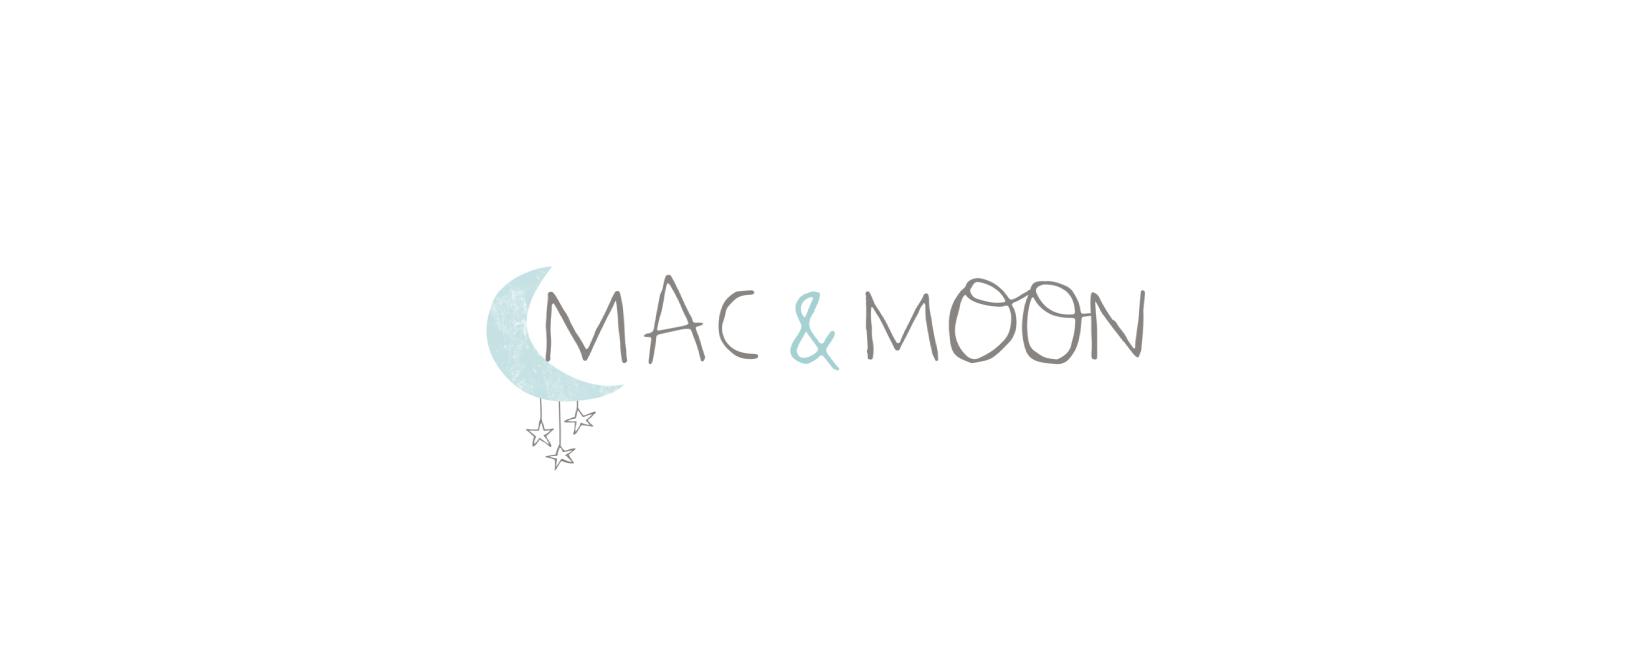 Mac & Moon Discount Code 2021